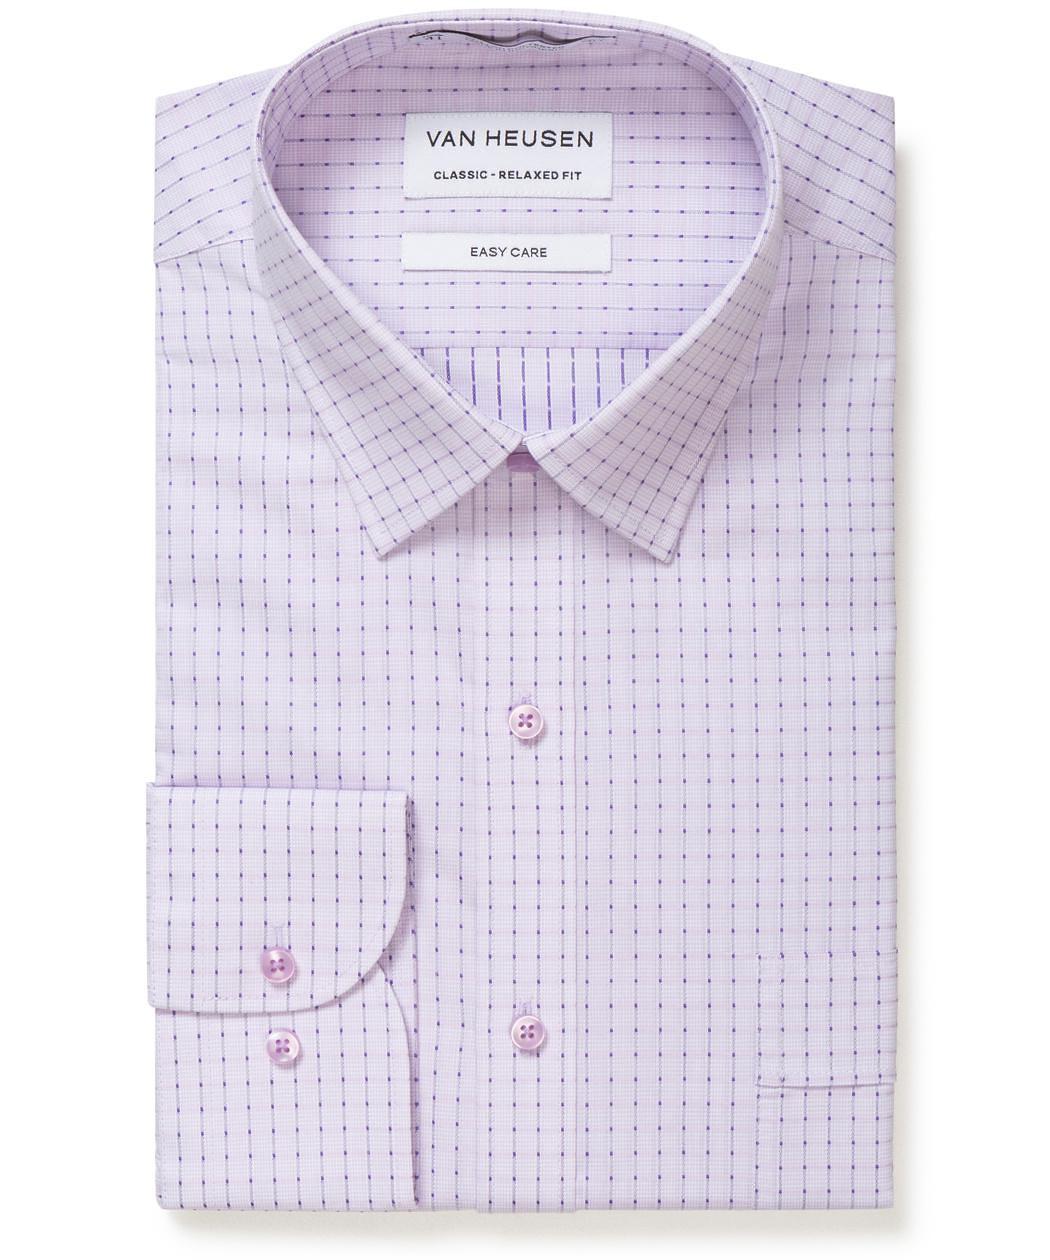 Van Heusen Classic Relaxed Fit Shirt Square Dot Check Mens